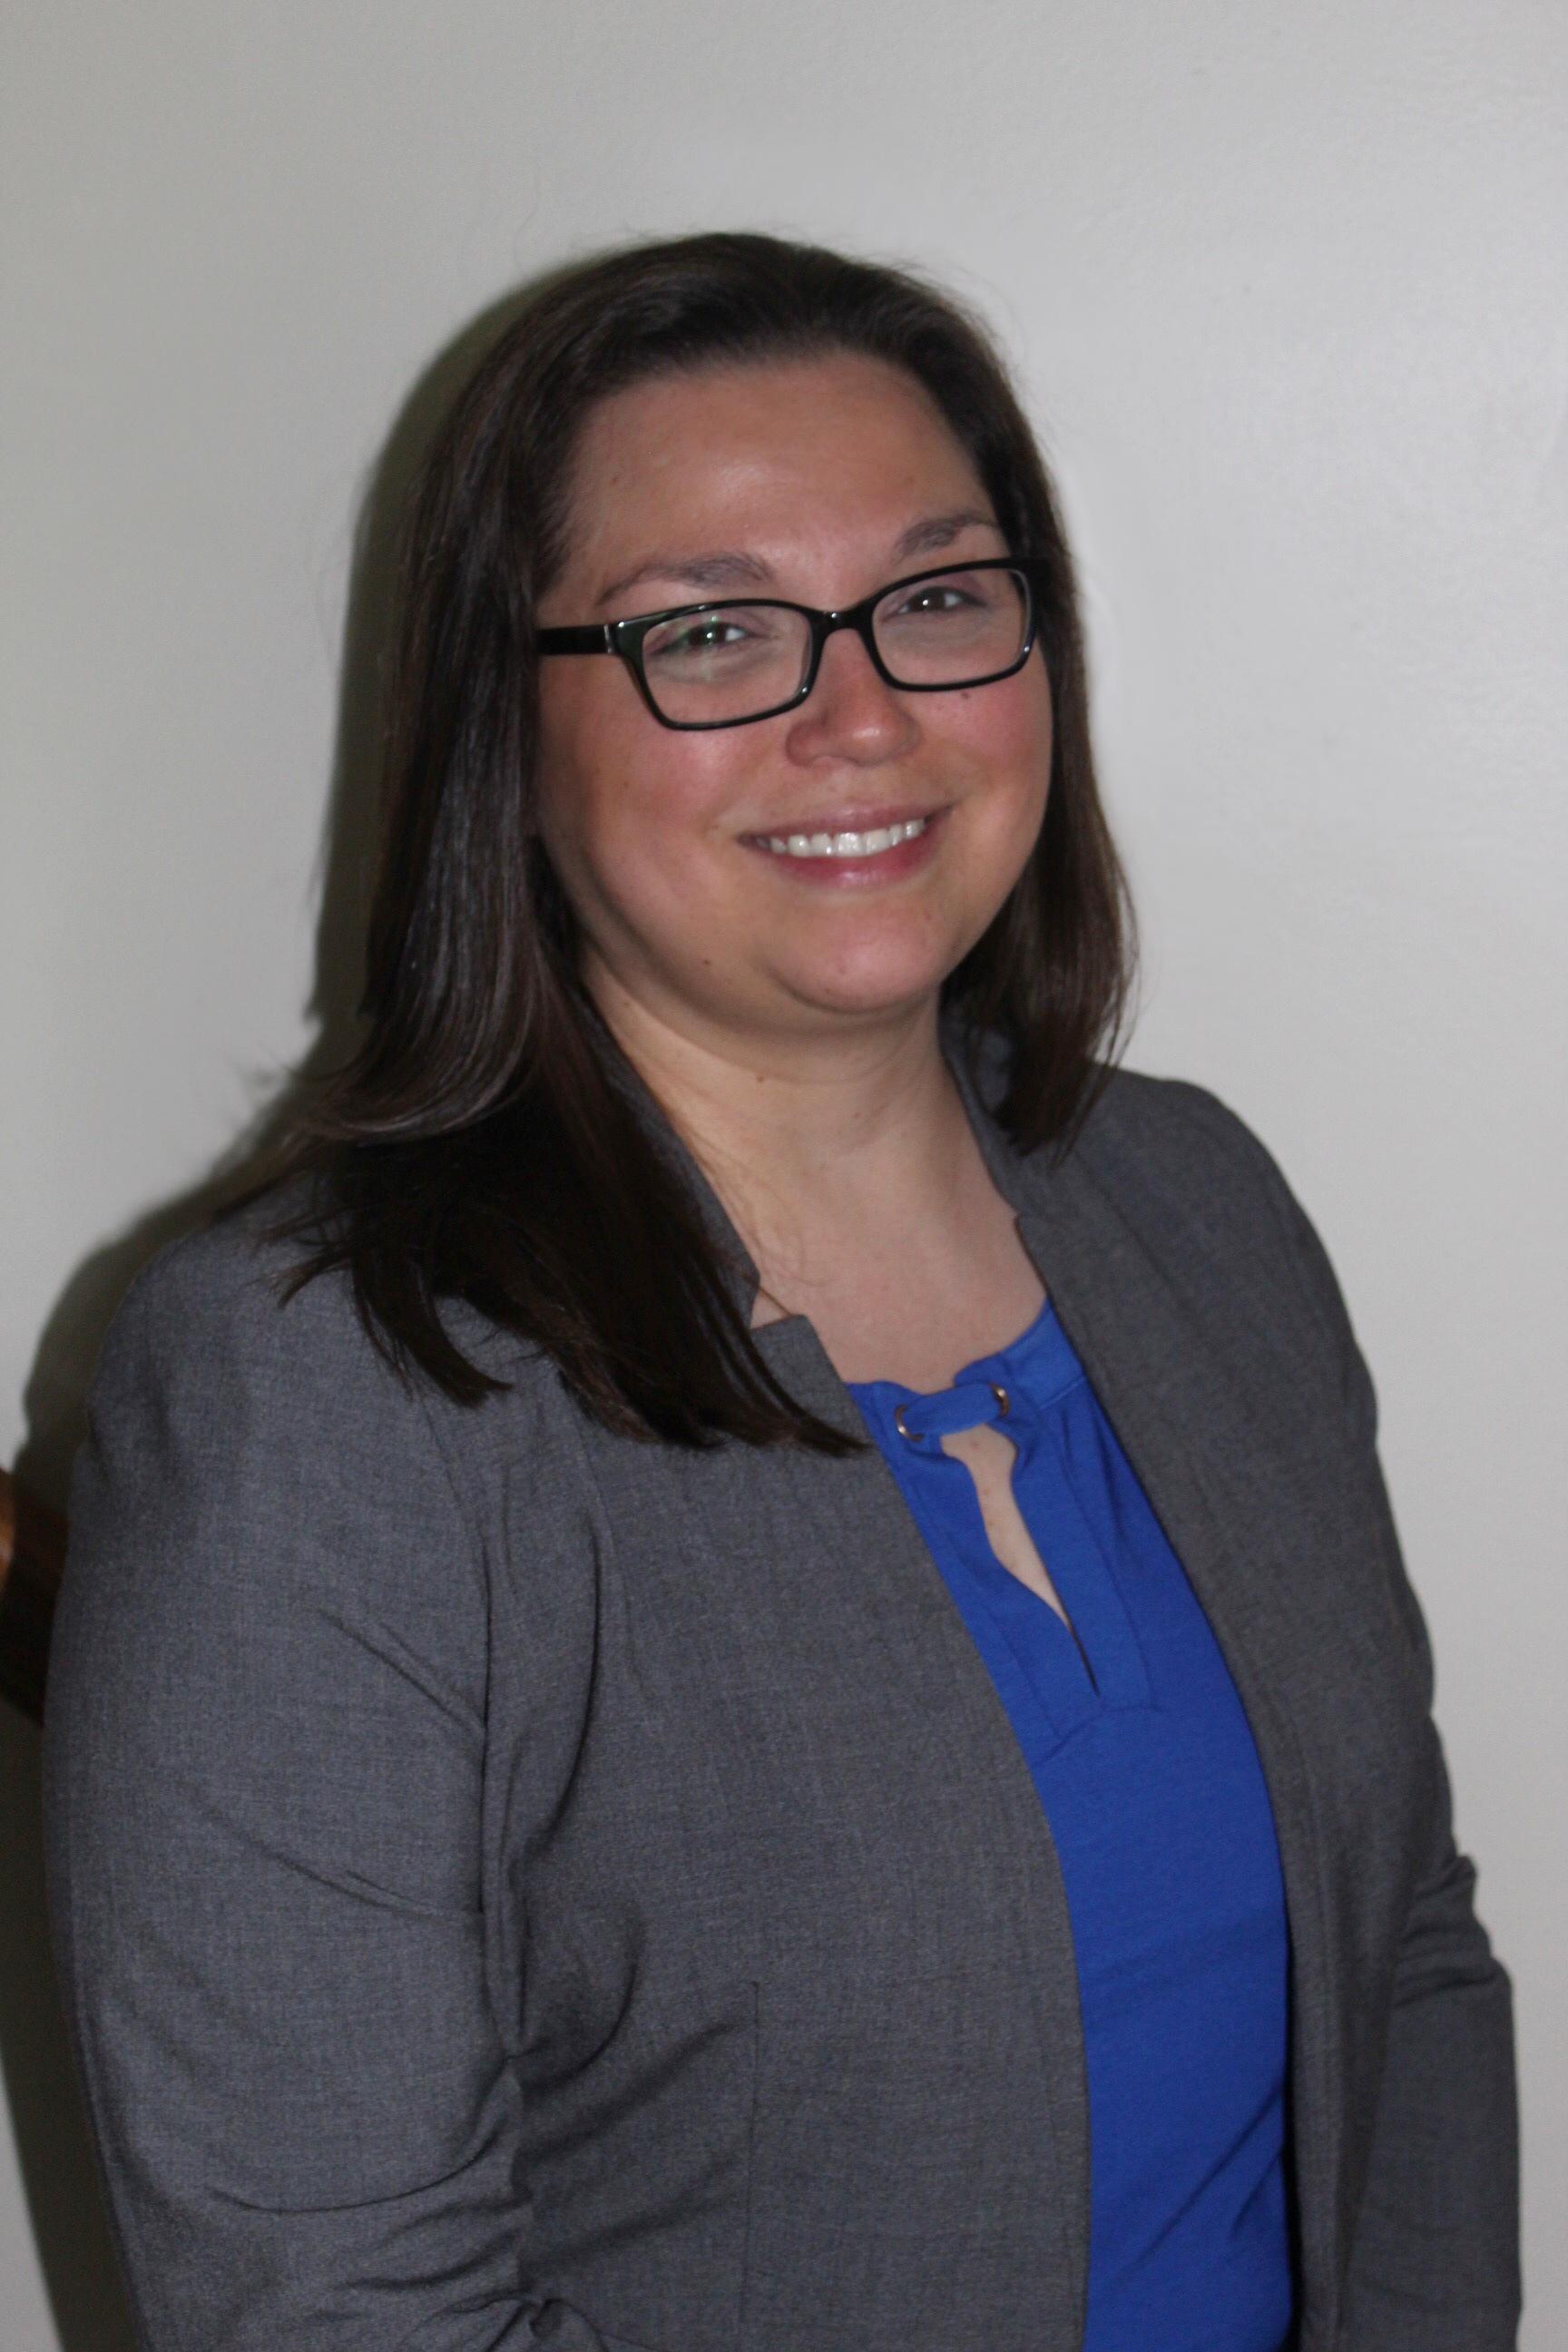 Amy Woolman, Nursing Home Expert